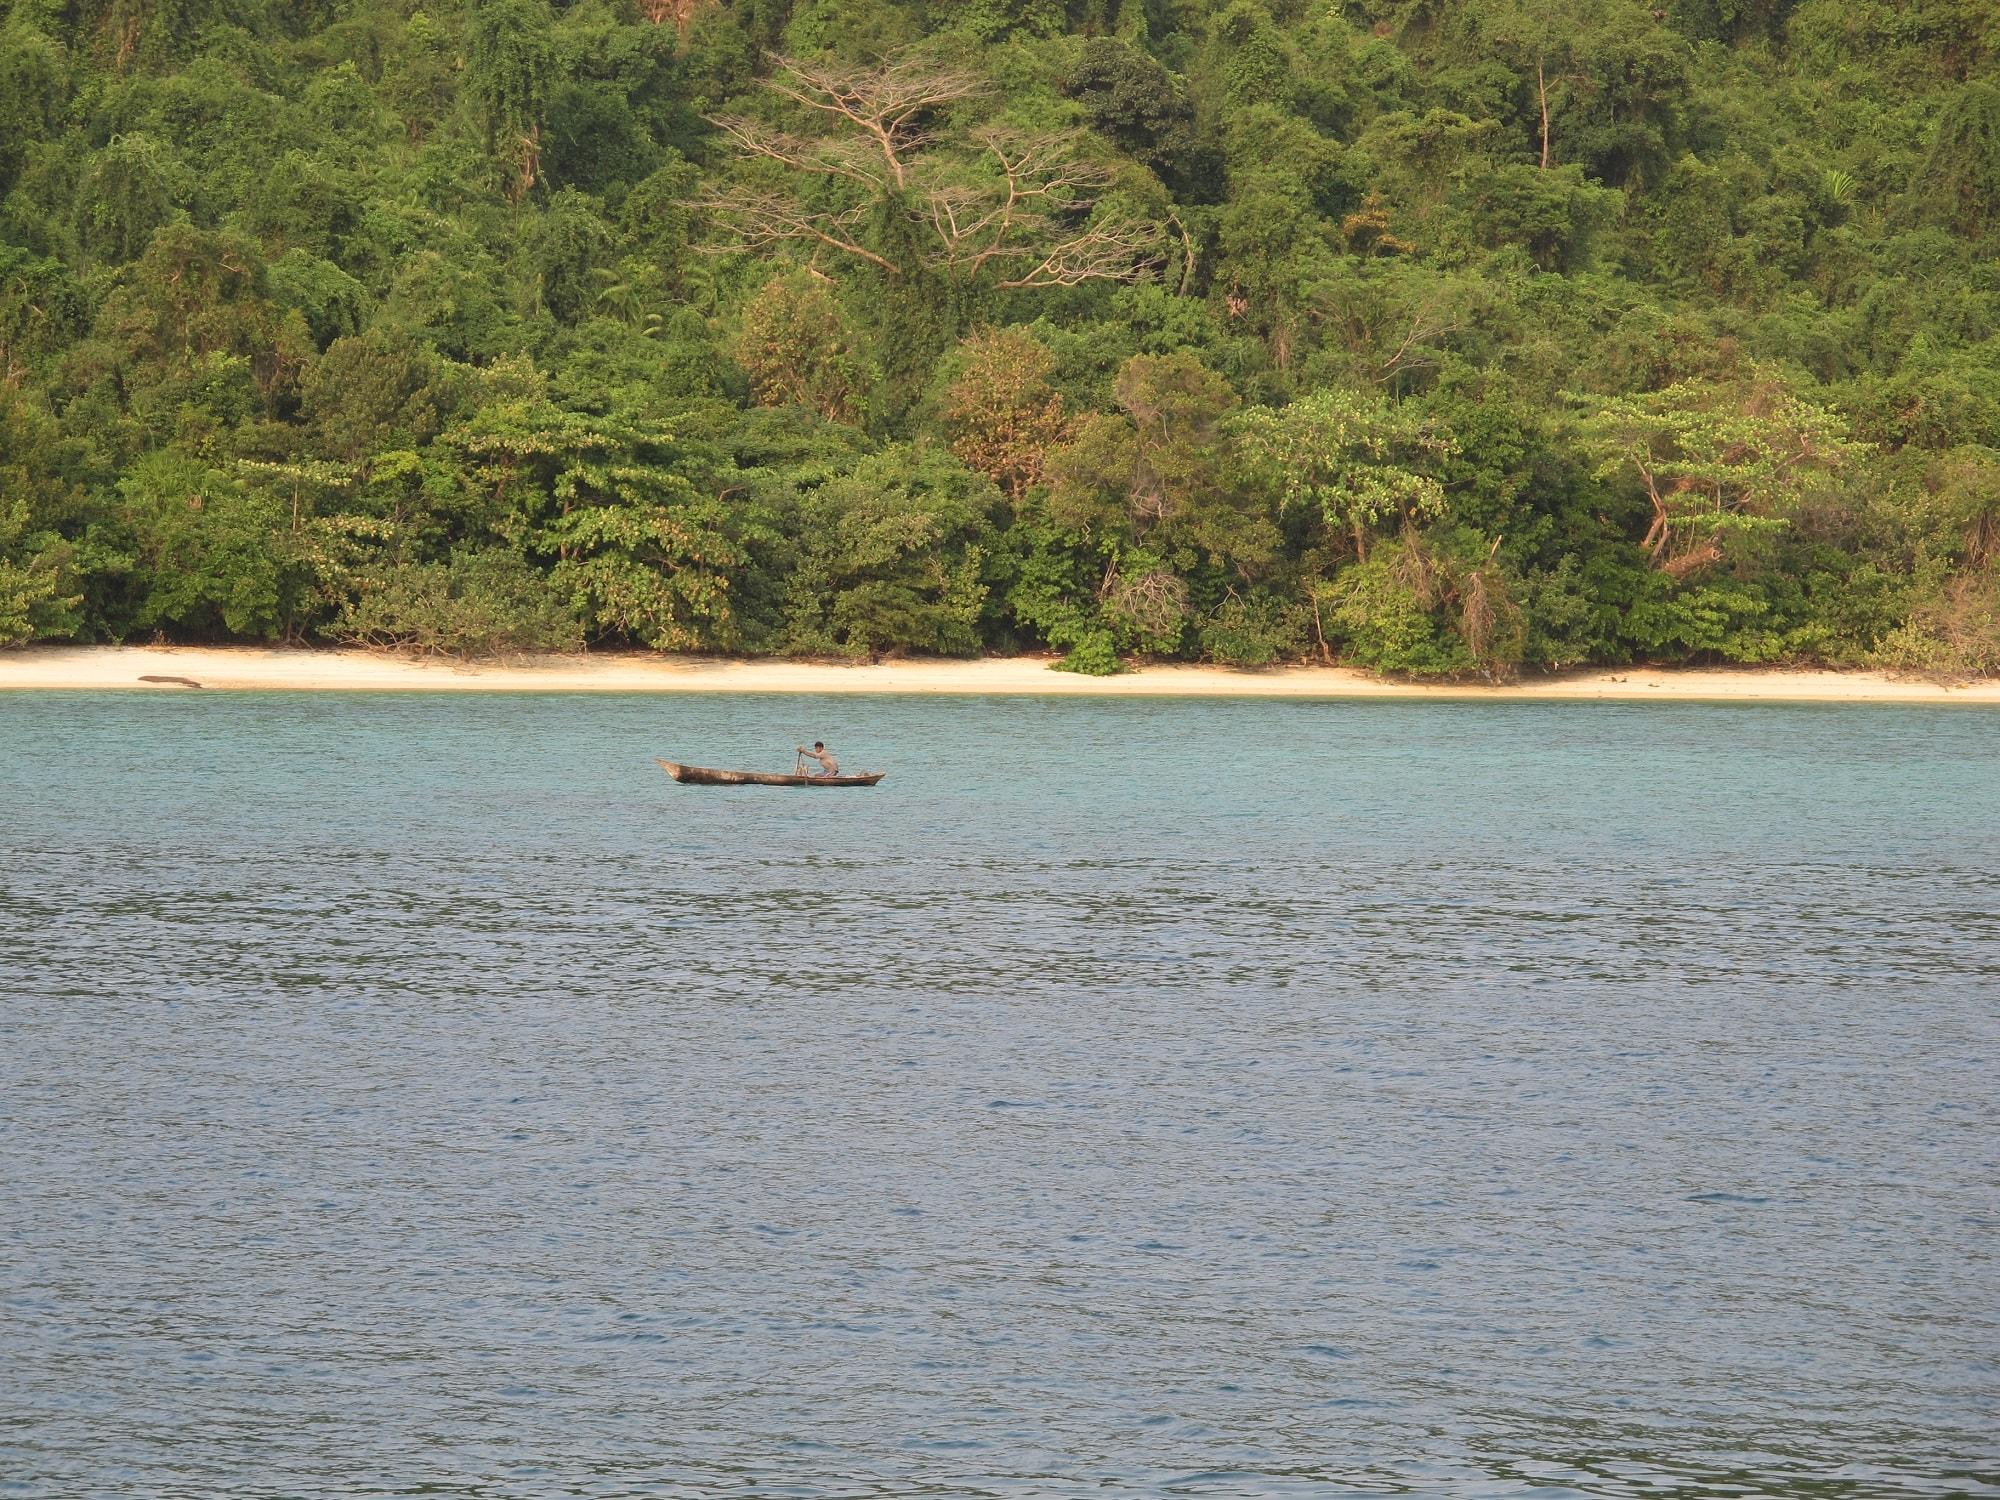 Myanmar deserted beach